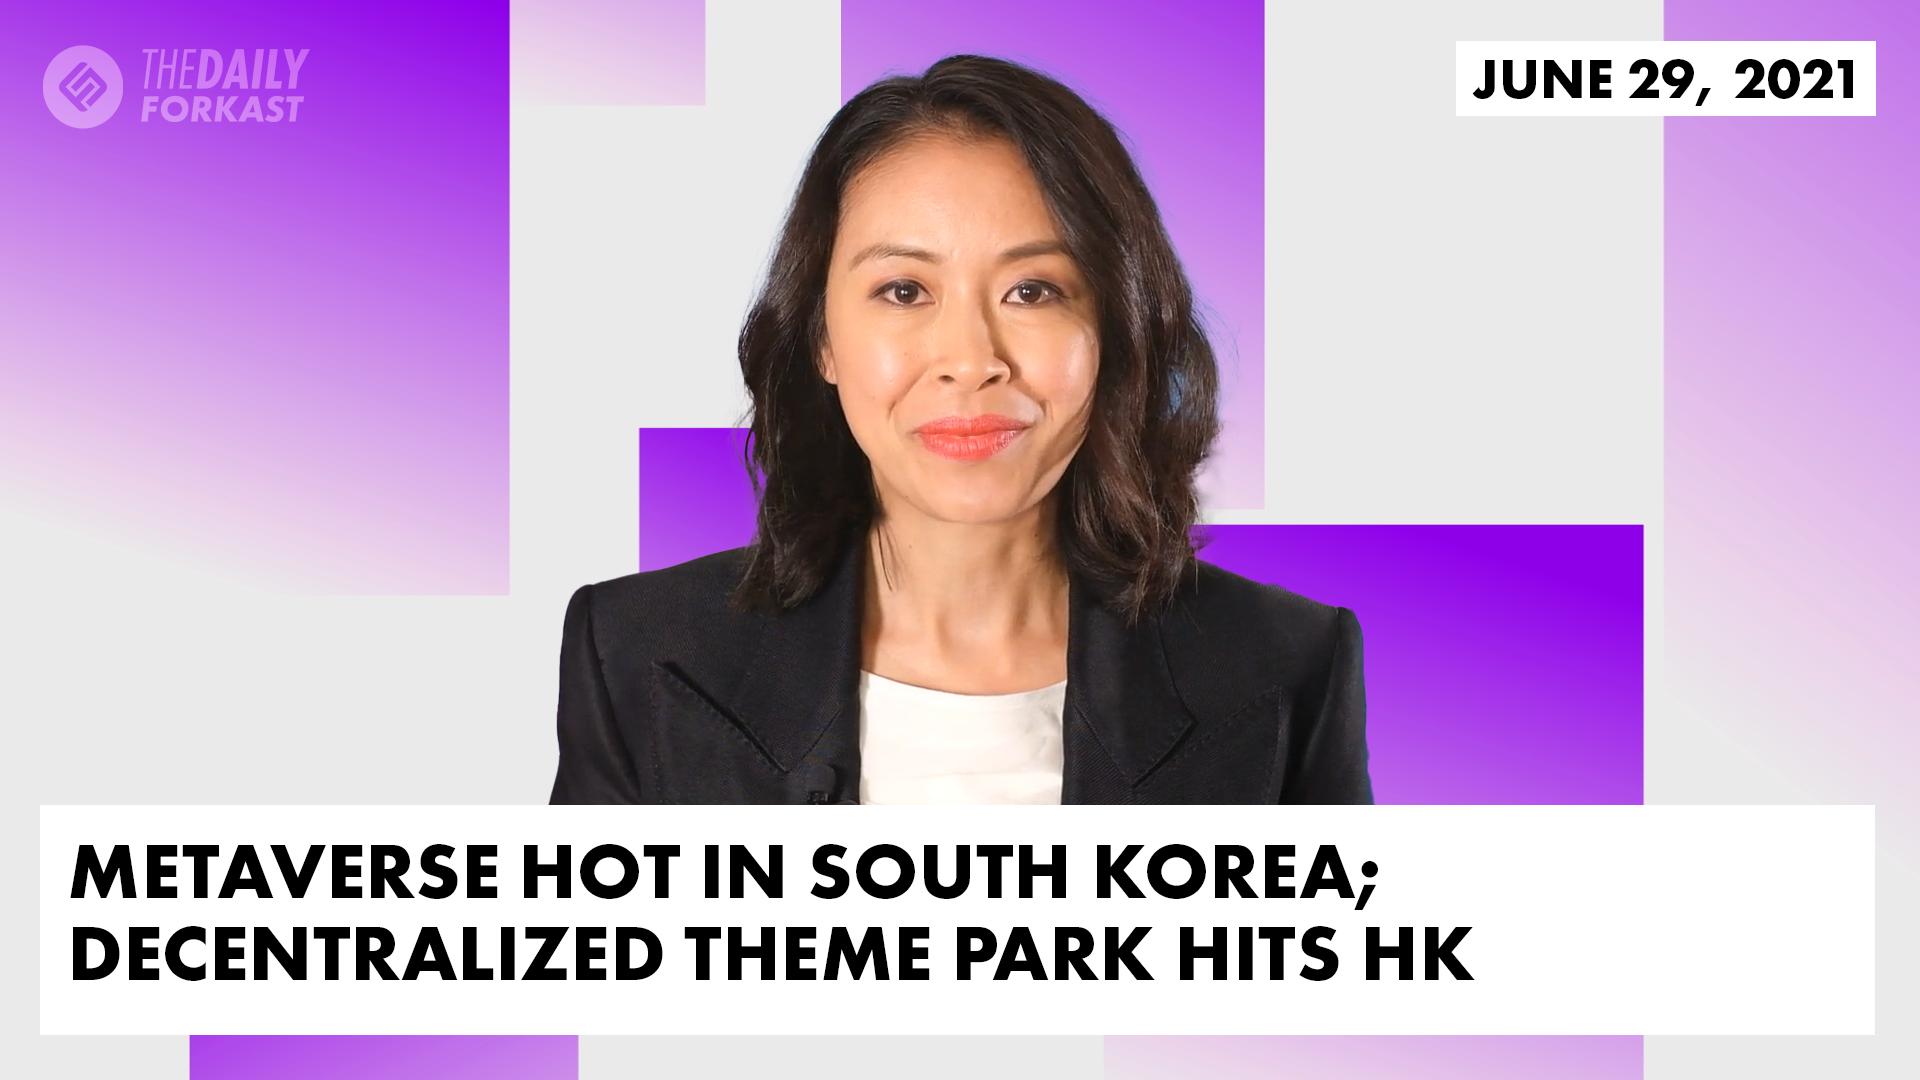 Metaverso caliente en Corea del Sur;  Parque temático descentralizado llega a Hong Kong